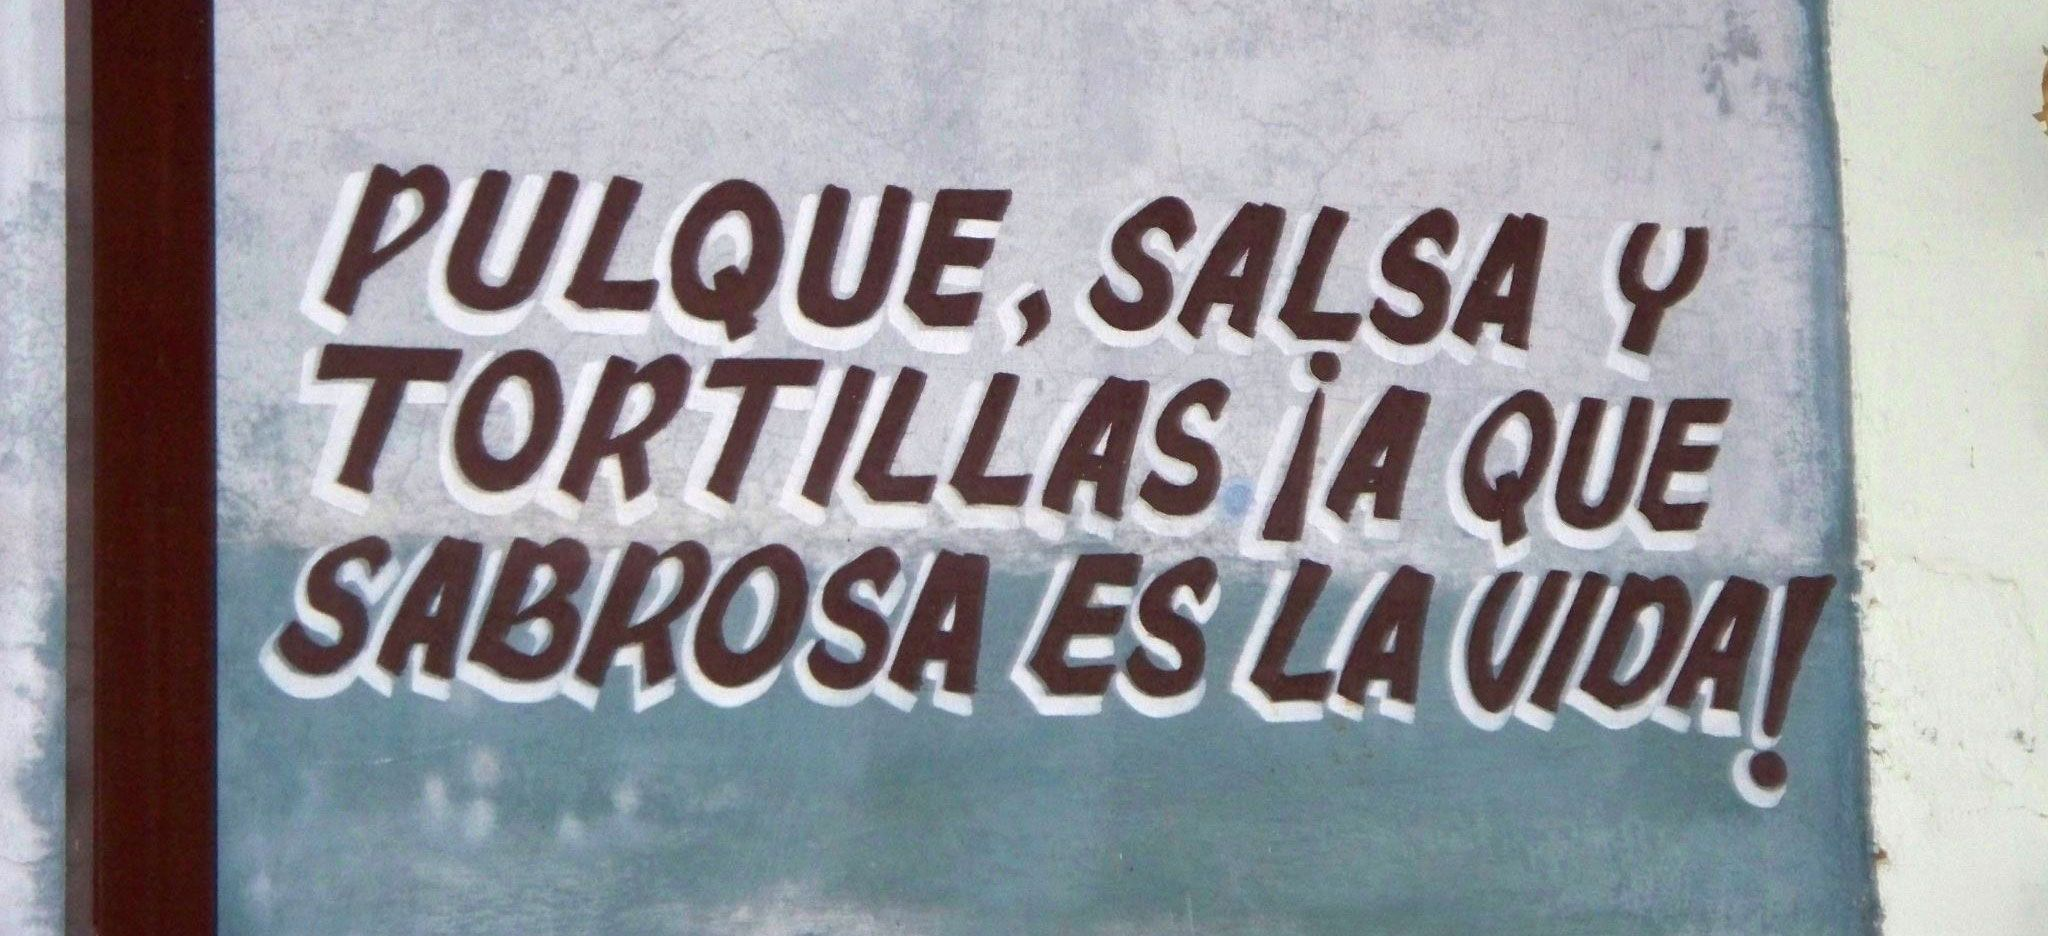 Dulces Mexicanos Frases: Bebidas Mexicanas, Gastronomia